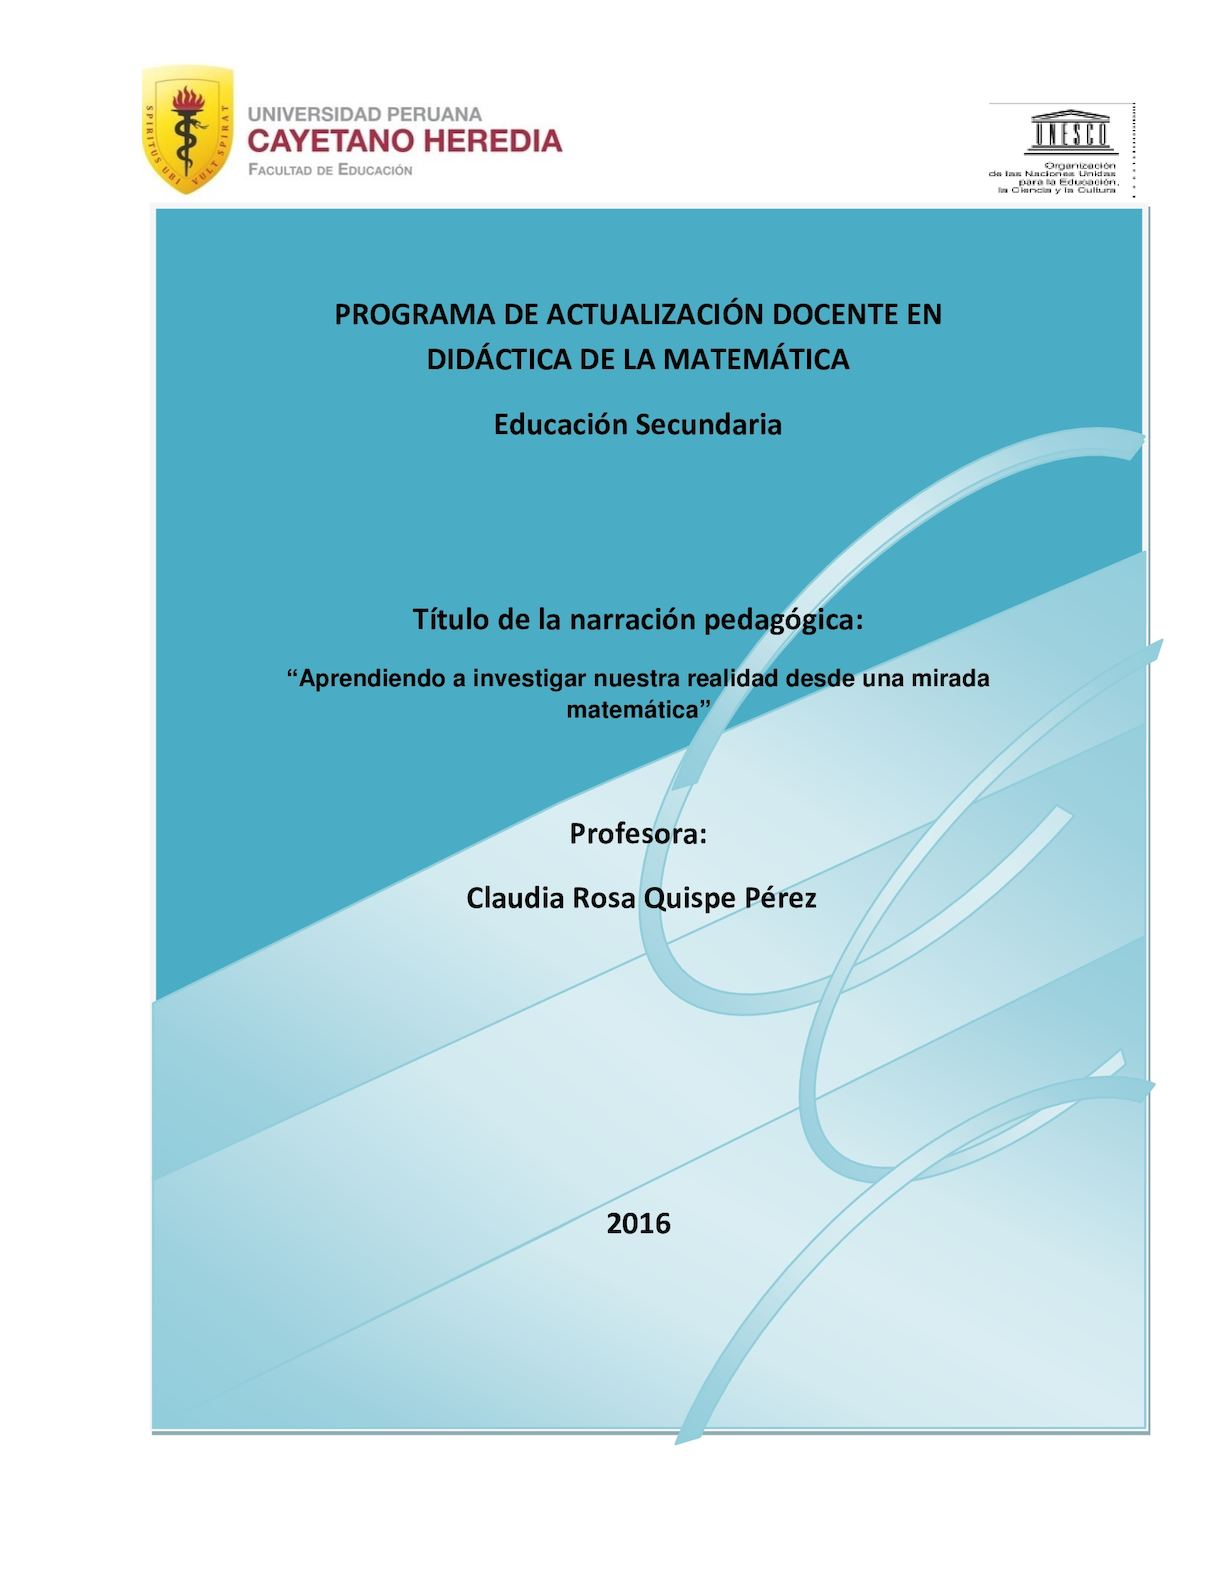 Trab Final Narración Pedagógica Quispe Pérez Claudia Rosa